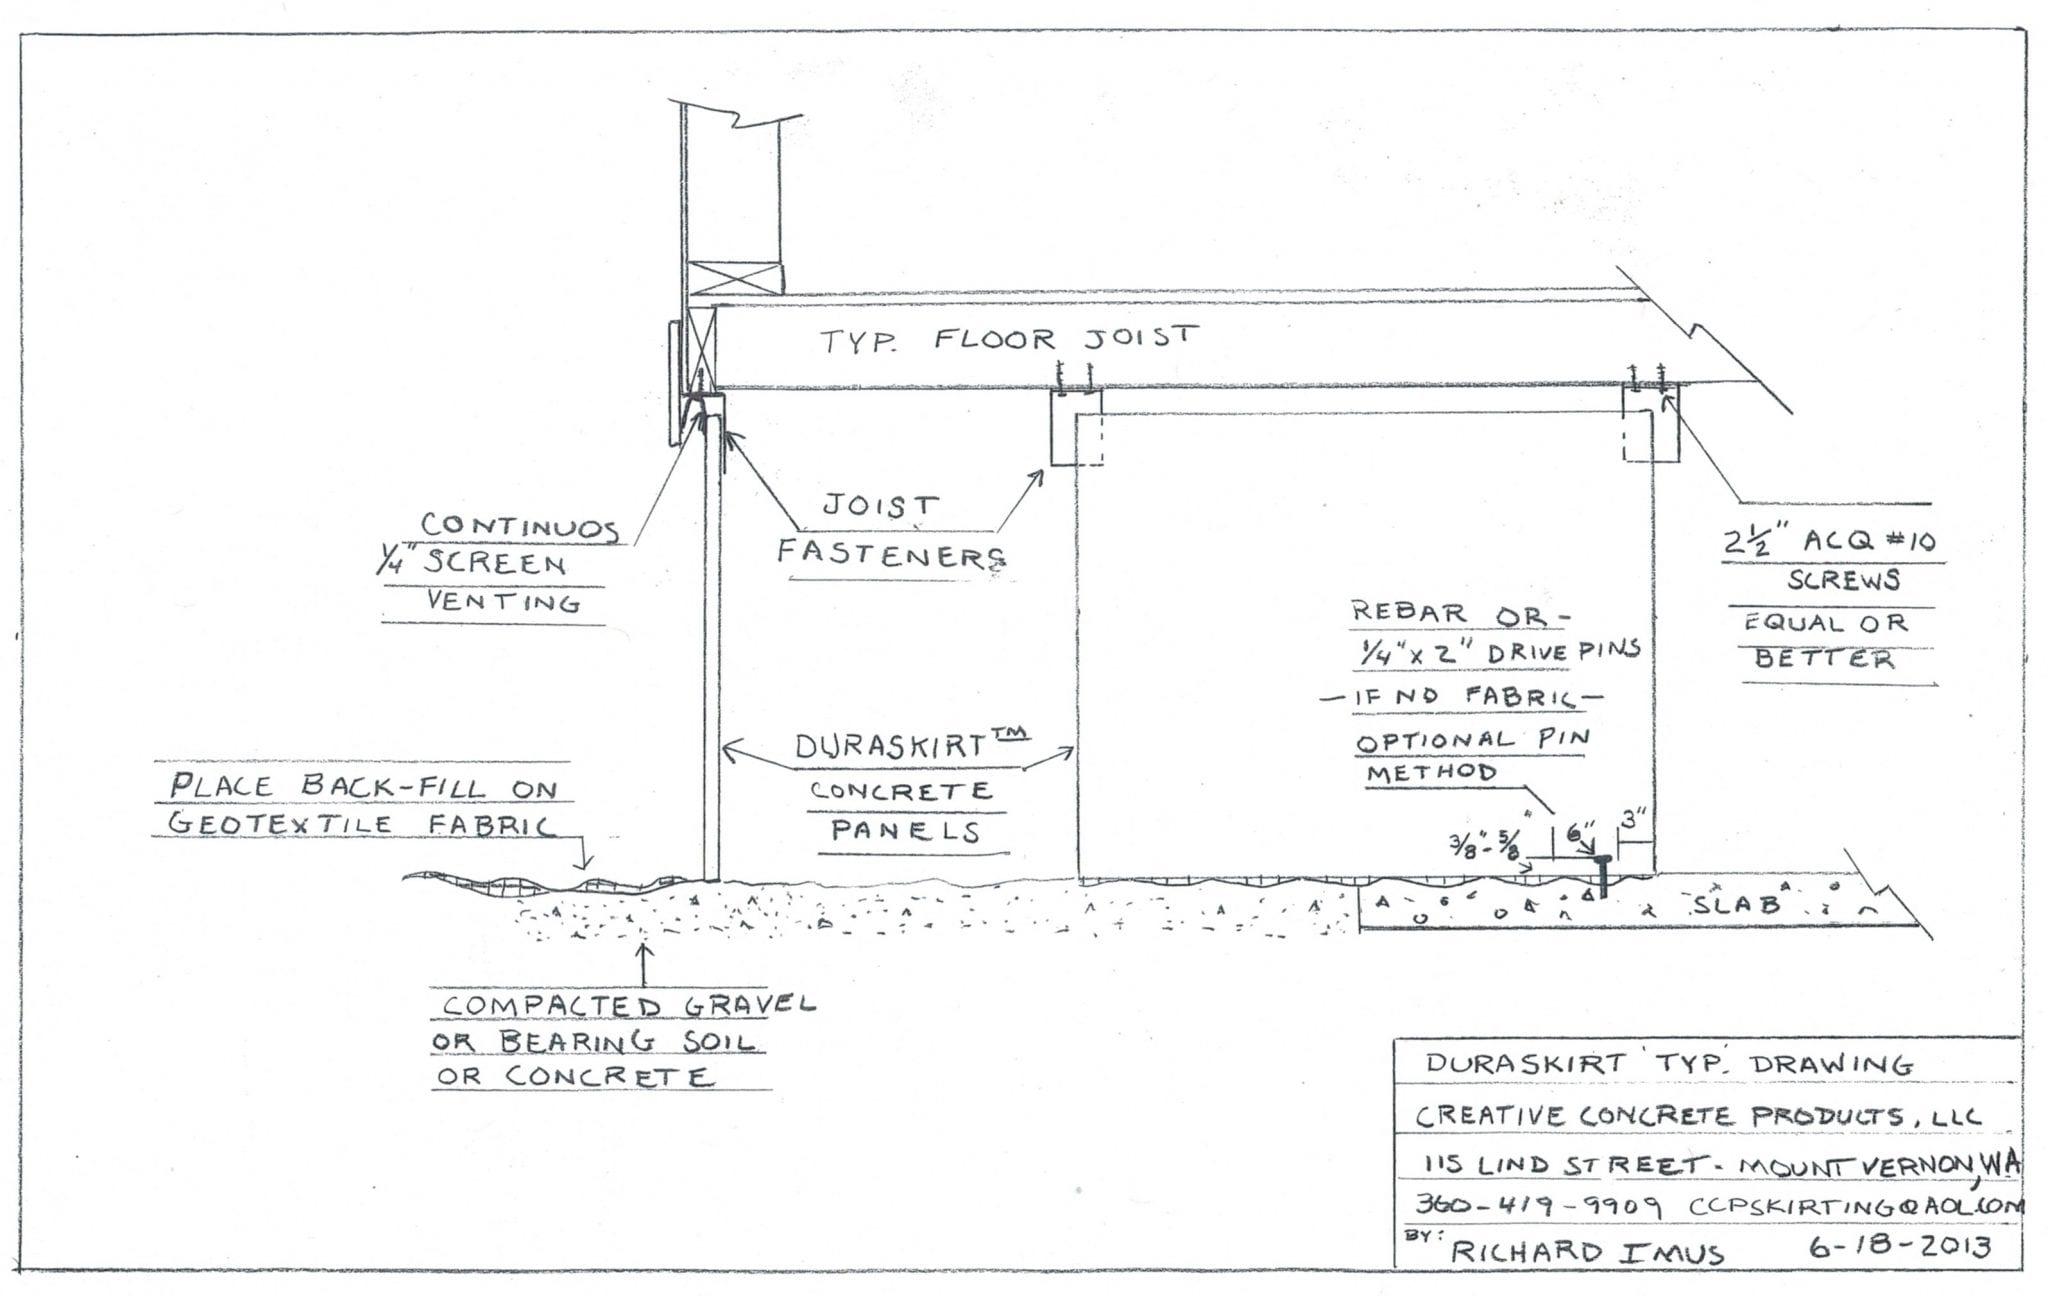 DURASKIRT™ Typical Mobile Home Skirting Installation Drawing.